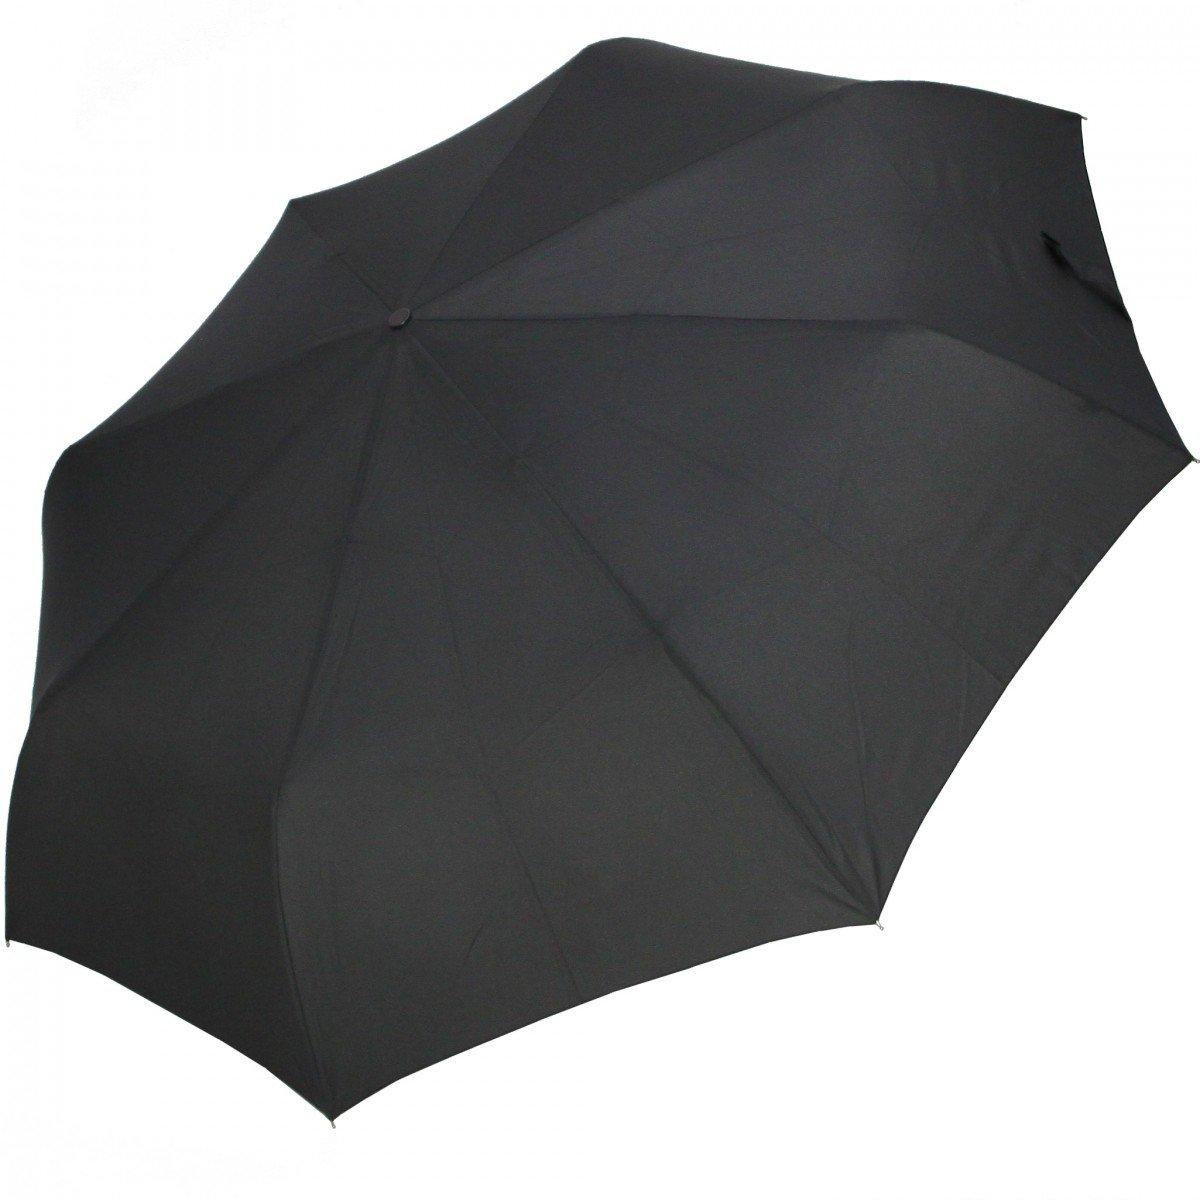 pierre cardin Regenschirm Schirm noir Easymatic Alupla Auf-Zu Automatik neu